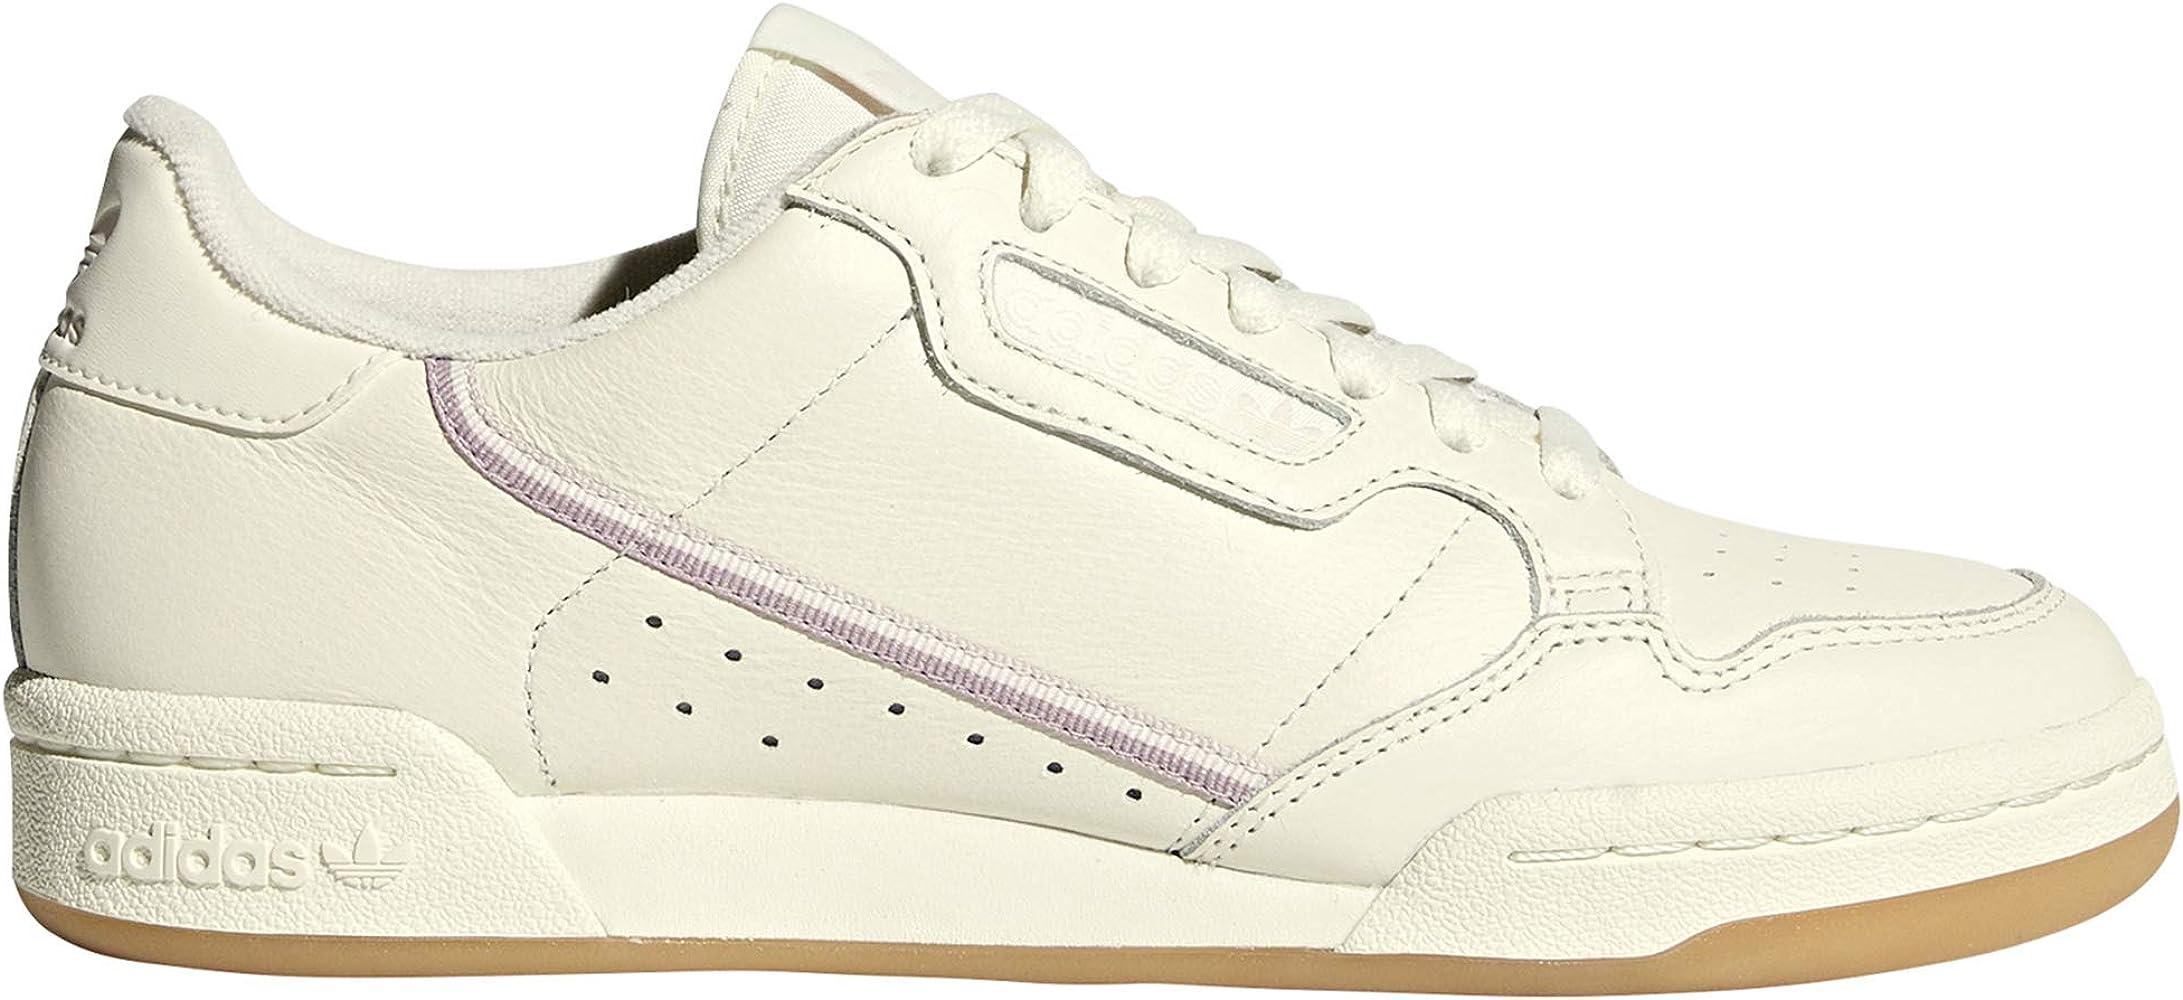 Continental FemmesTennis Adidas 80 WhiteBasket Mode Pour Les mn0wOvN8